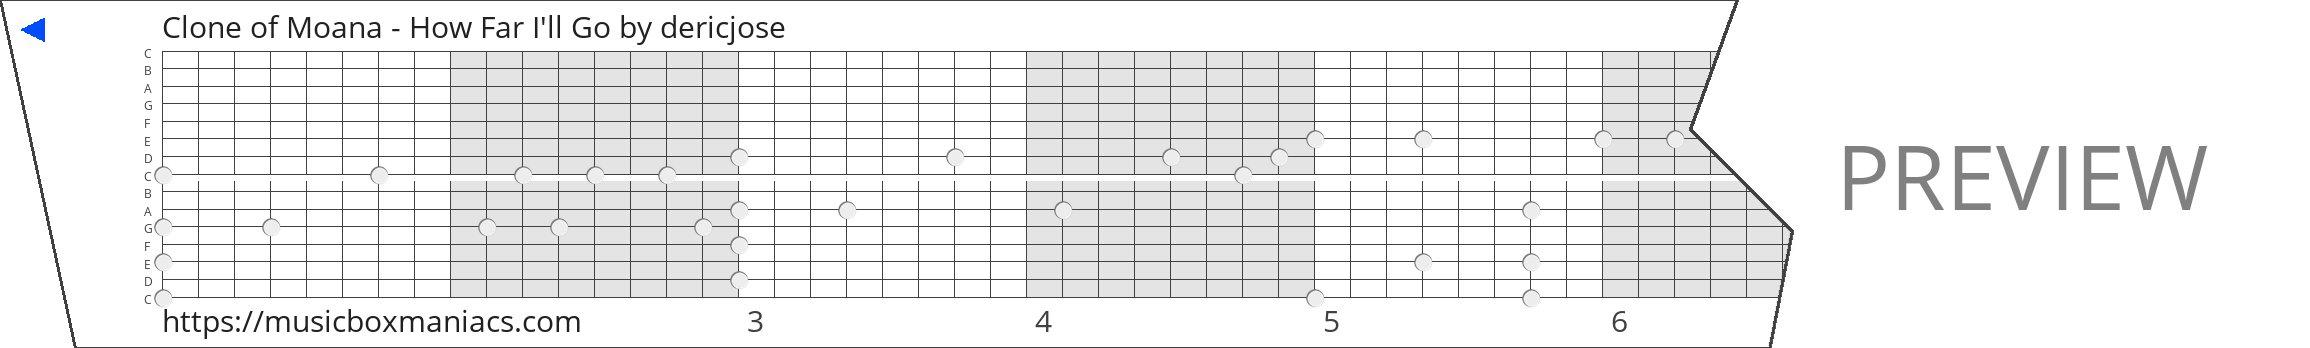 Clone of Moana - How Far I'll Go 15 note music box paper strip